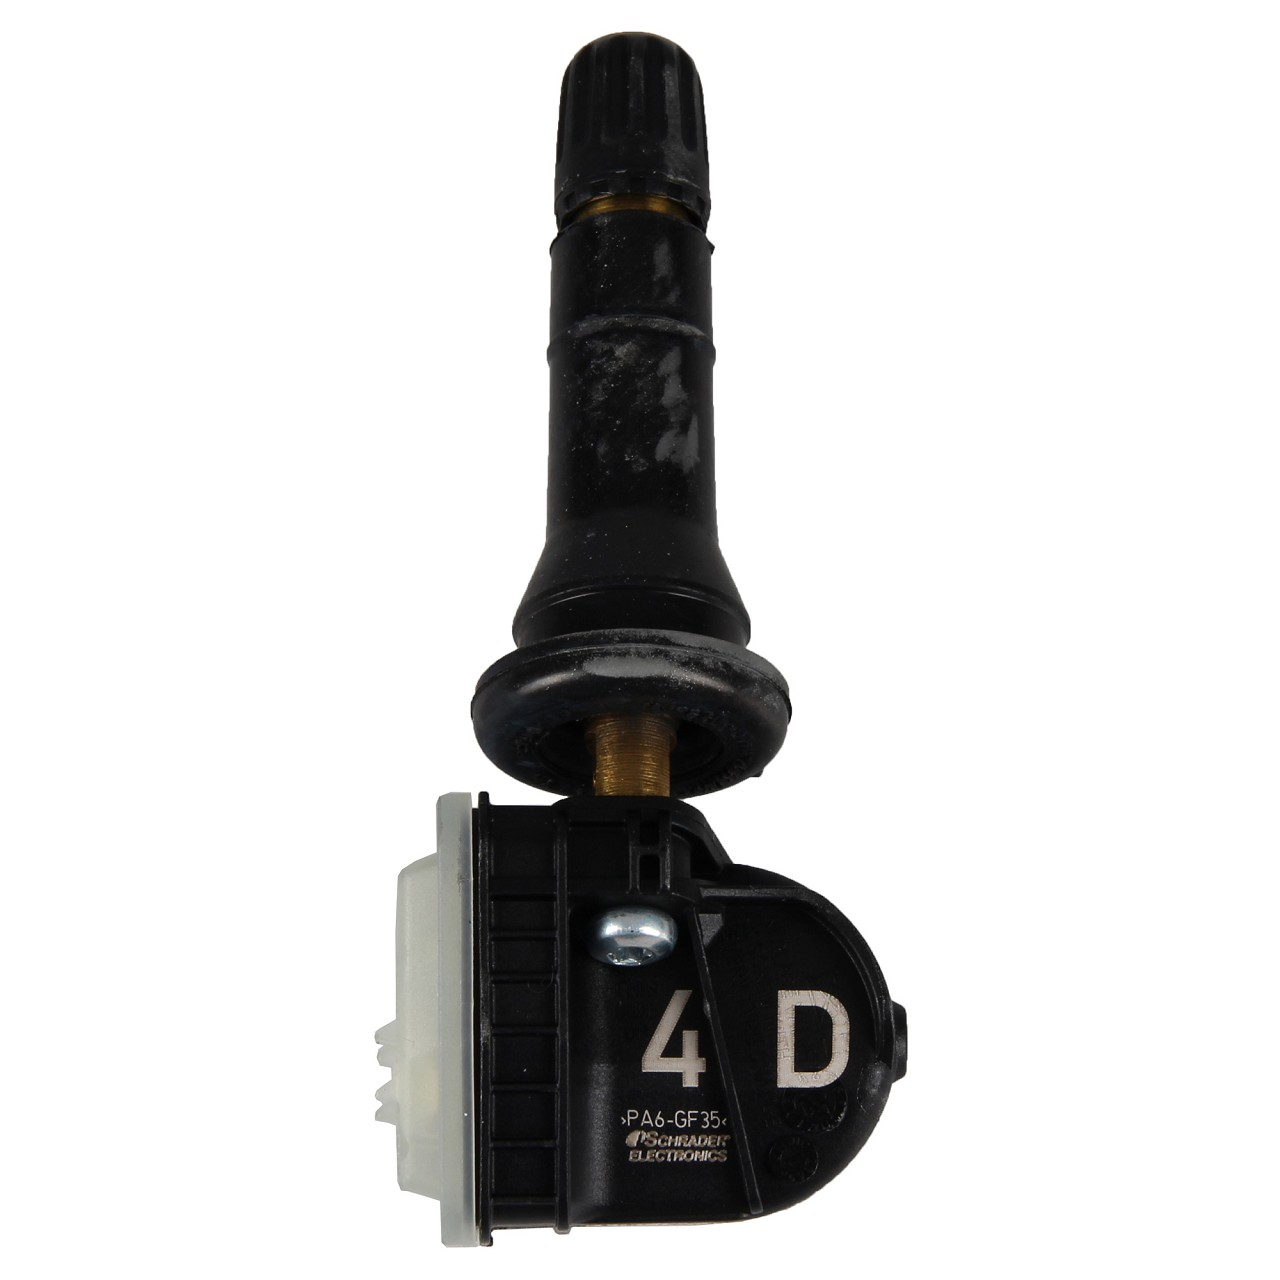 ORIGINAL GM Opel RDKS Reifendrucksensor Luftdrucksensor INSIGNIA B 13597645